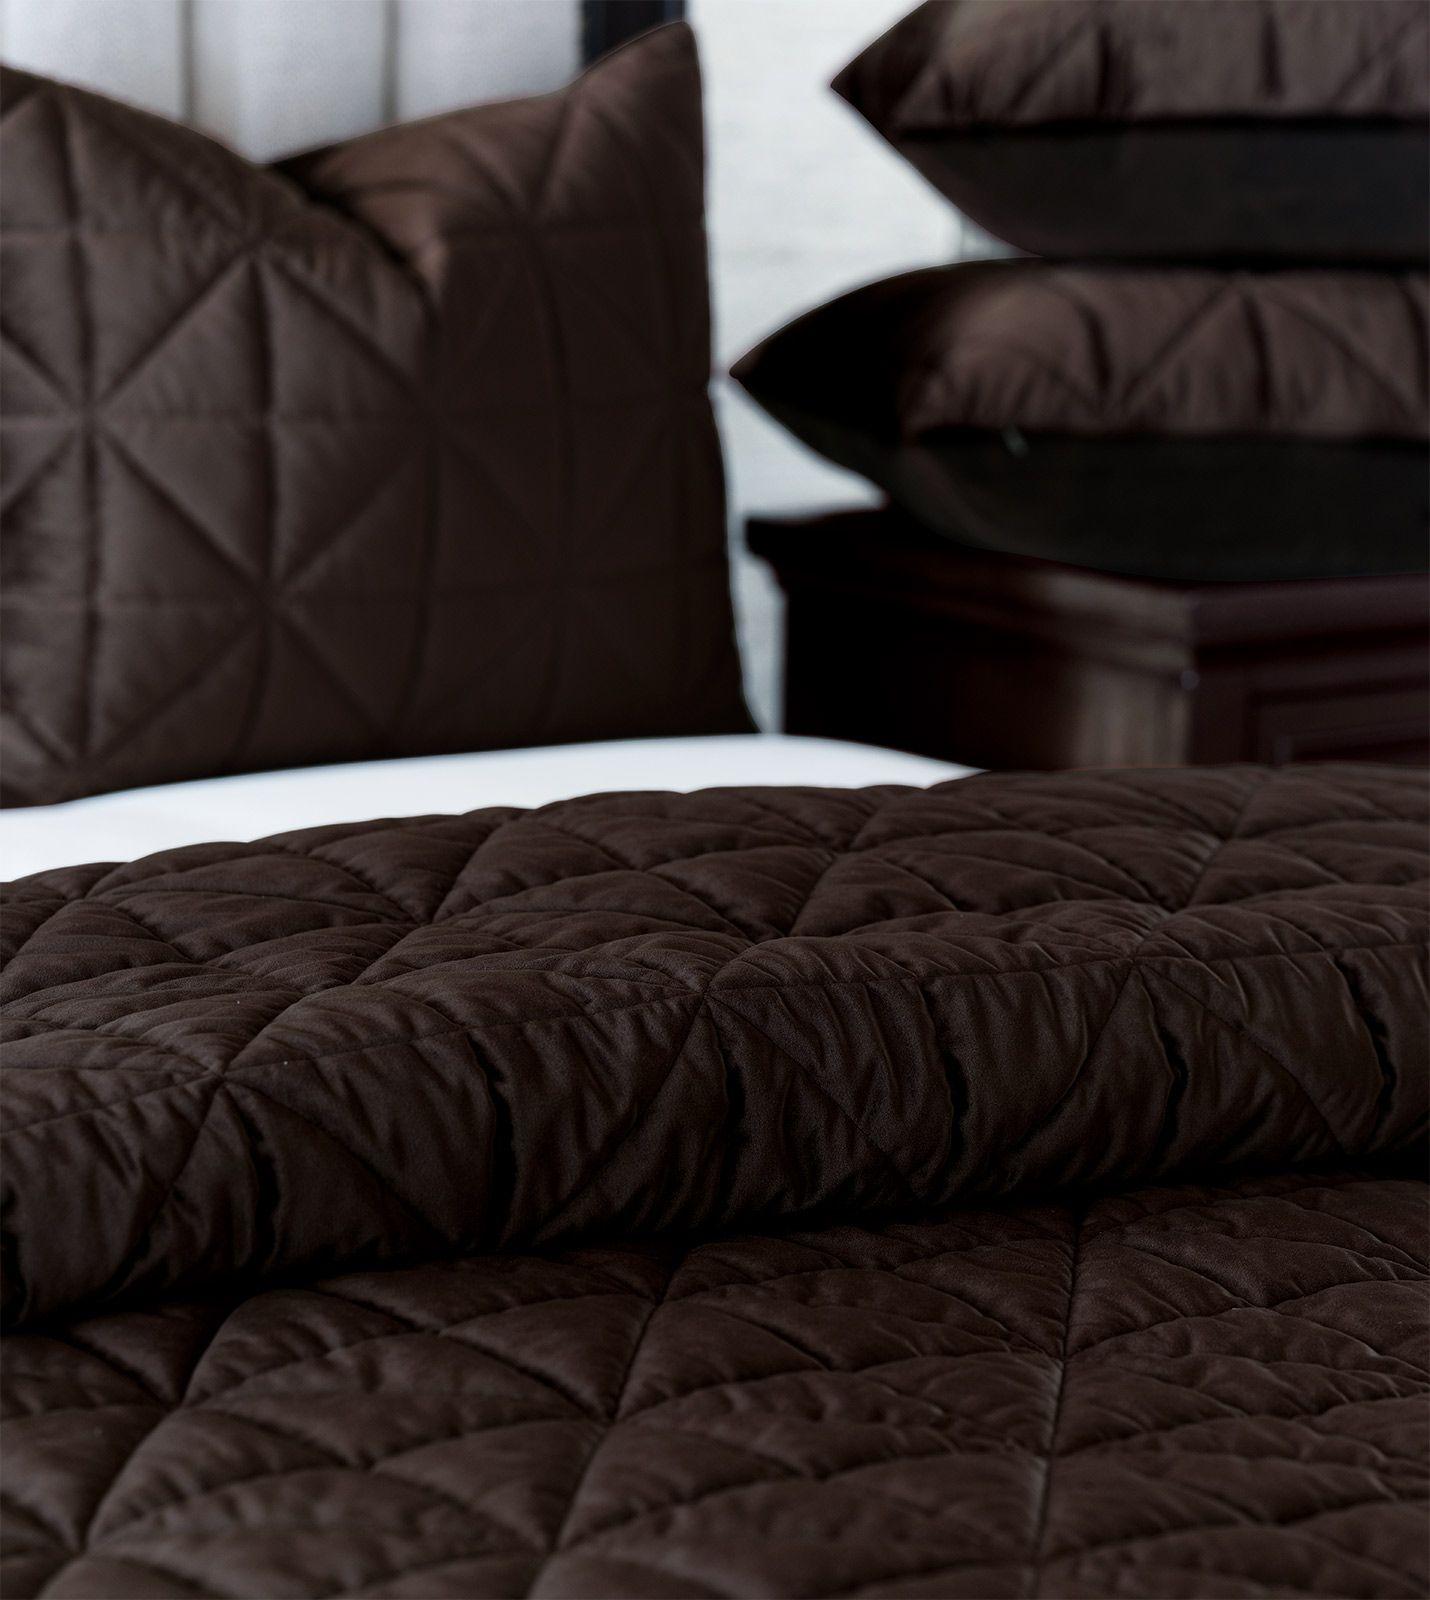 Cocoa Brown Quilted Velvet Coverlets Shams De Medici Nova Beige Bed Linen Bed Linens Luxury White Linen Bedding